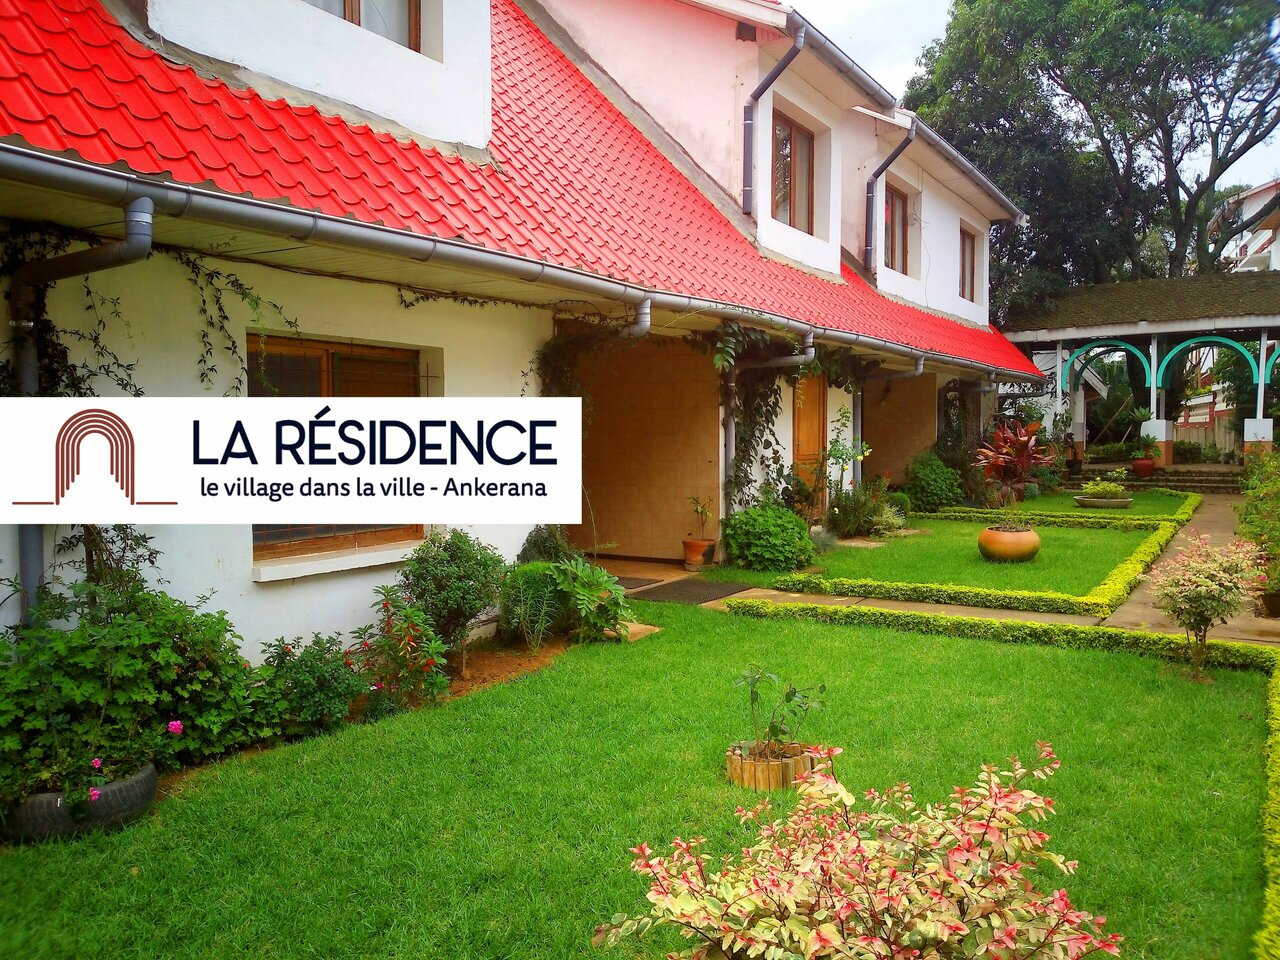 La Residence